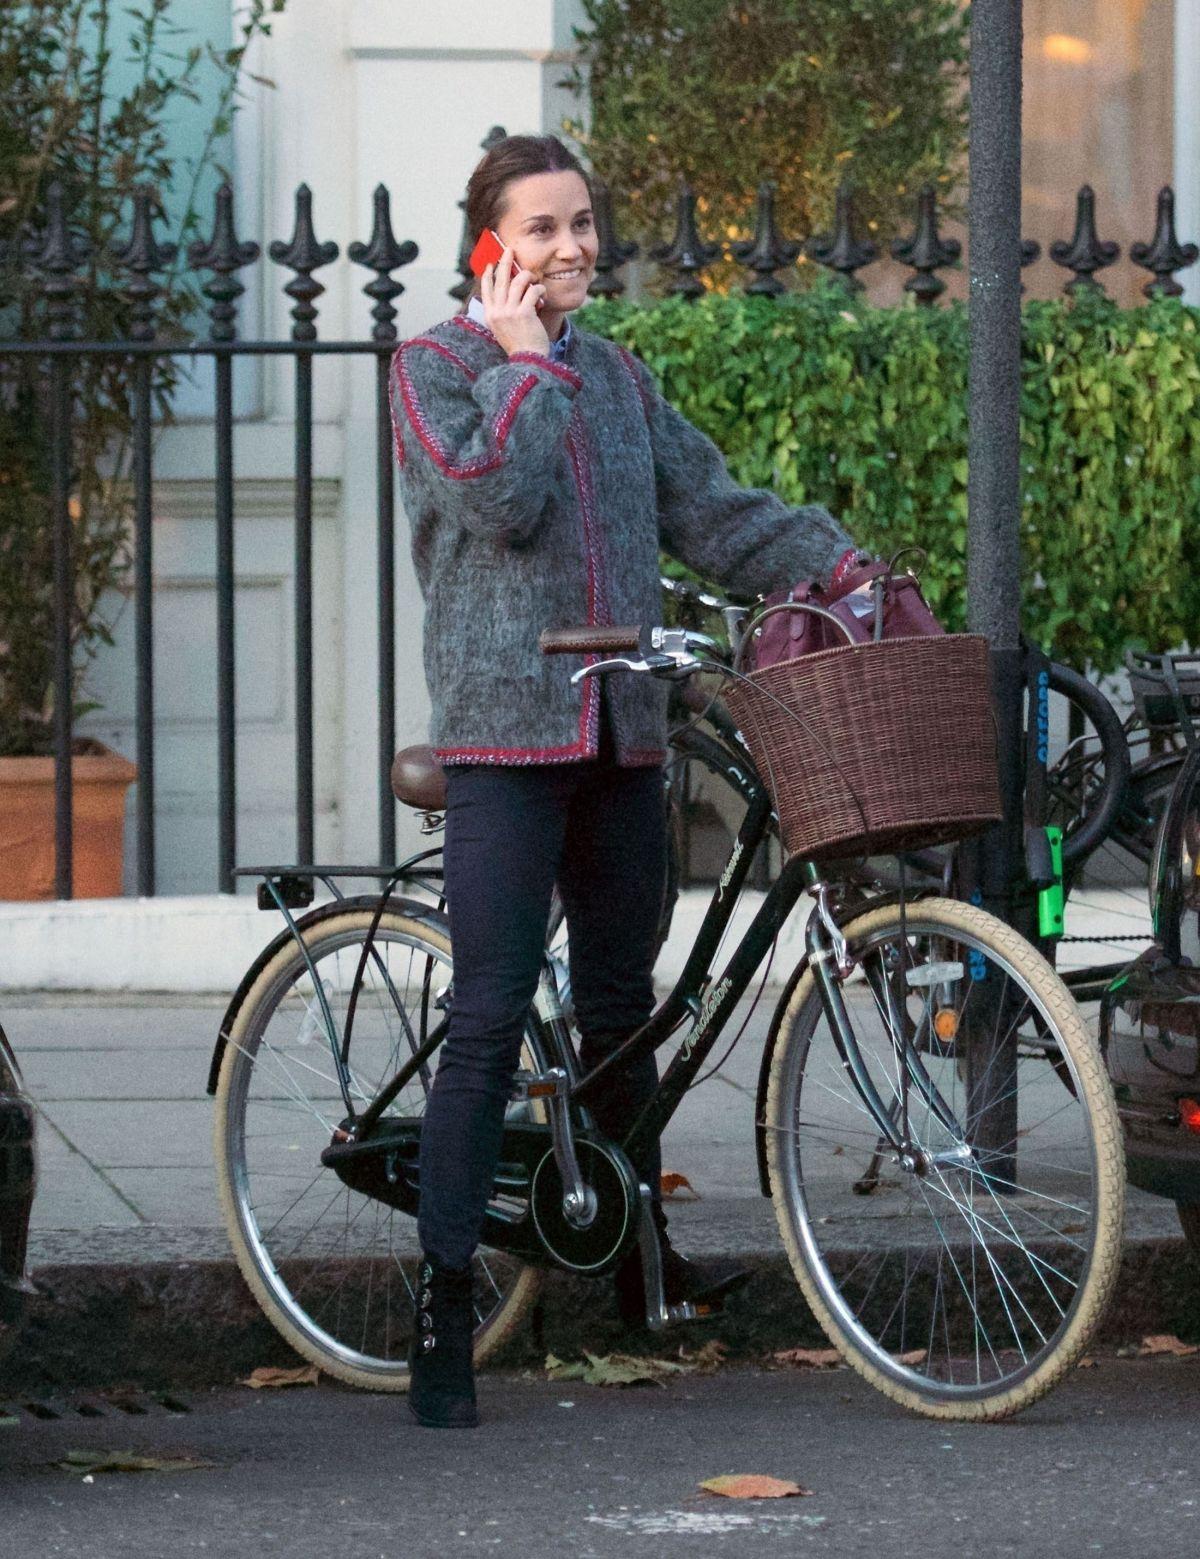 Sara Jean Underwood Bike Cool pippa middleton out on her bike in chelsea 11/08/2017 | celebs